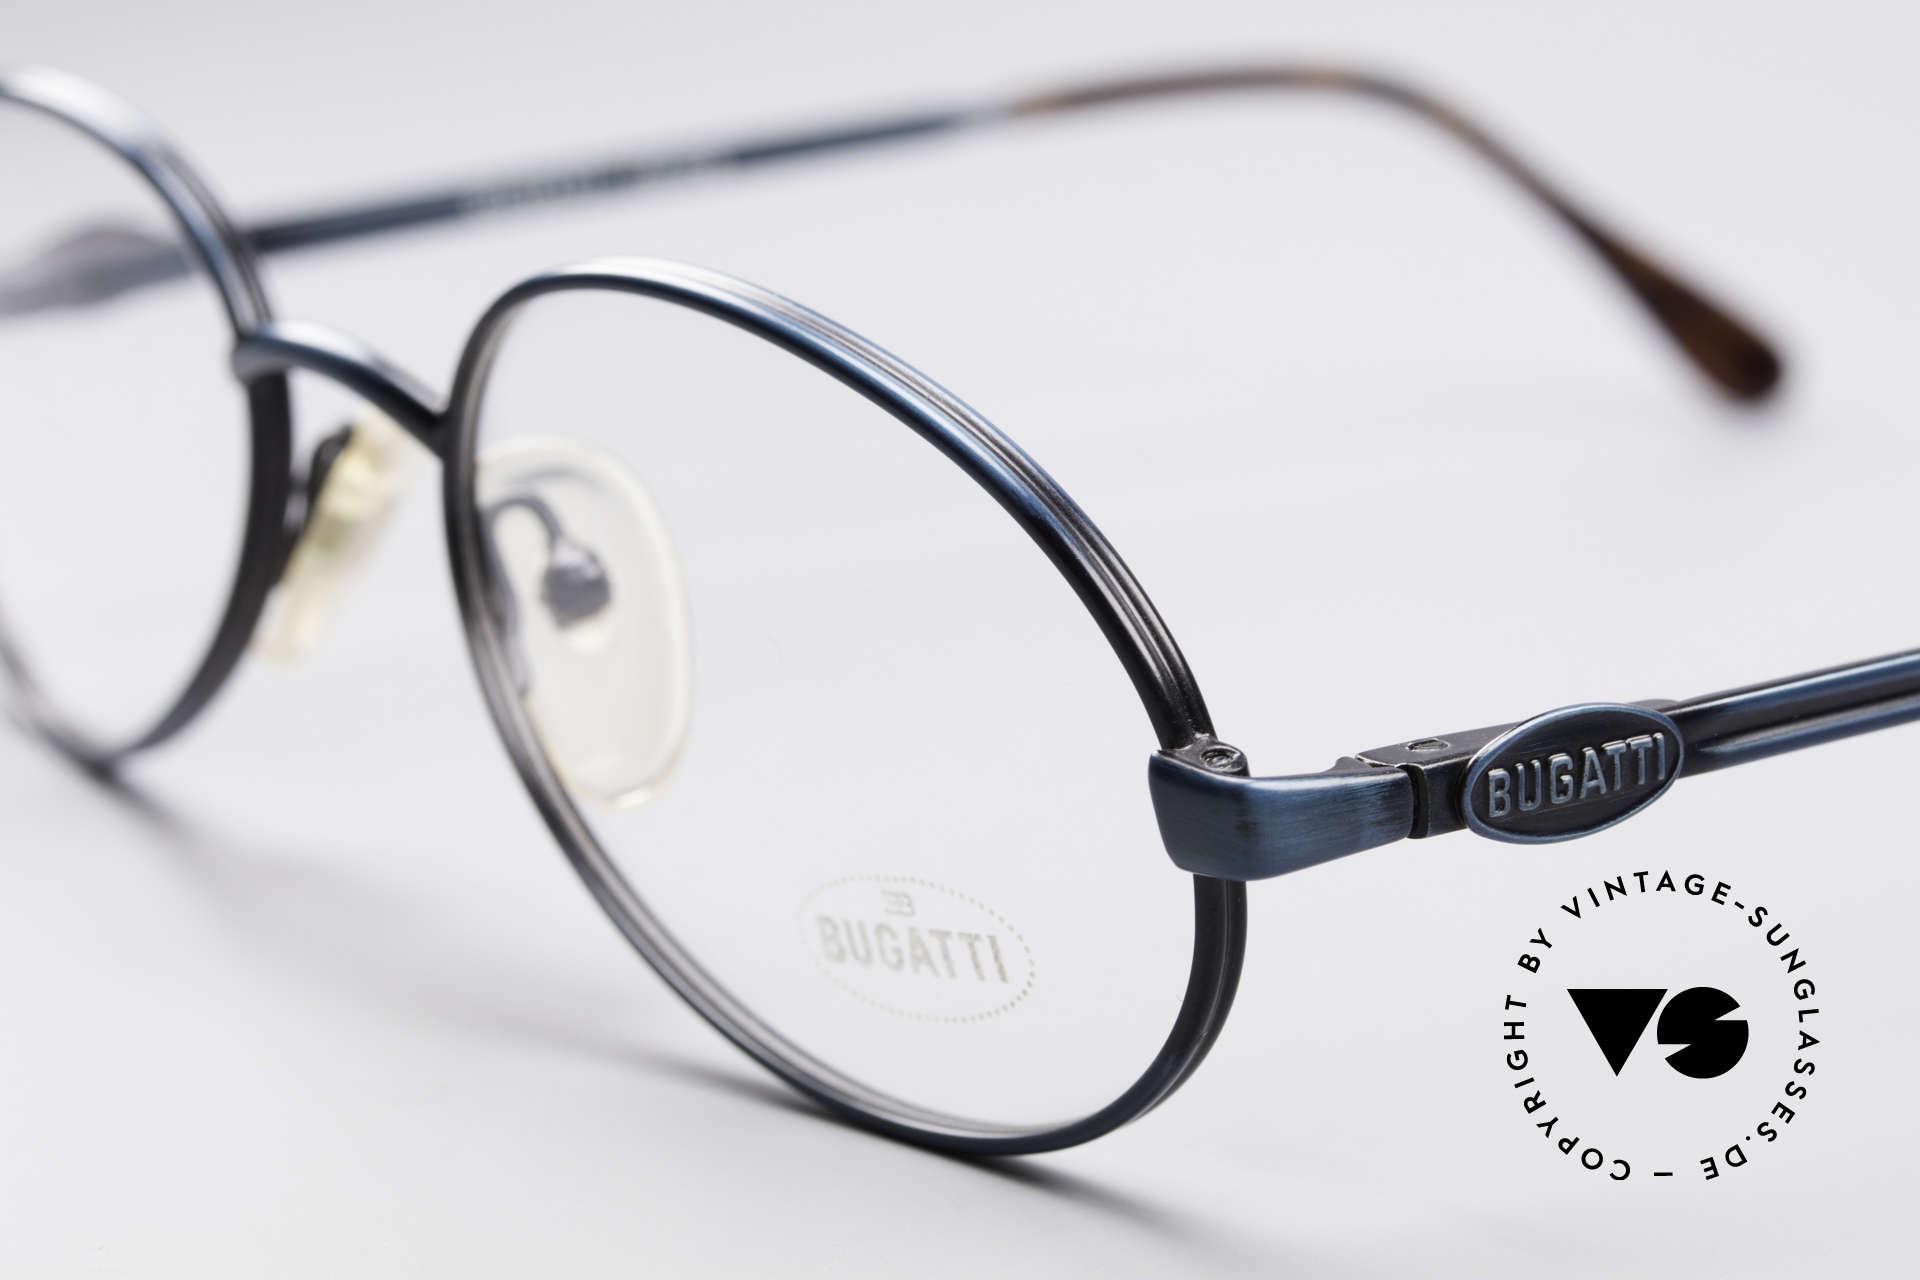 Bugatti 05728 Rare 90's Eyeglasses, 1st class wearing comfort & top-notch craftsmanship, Made for Men